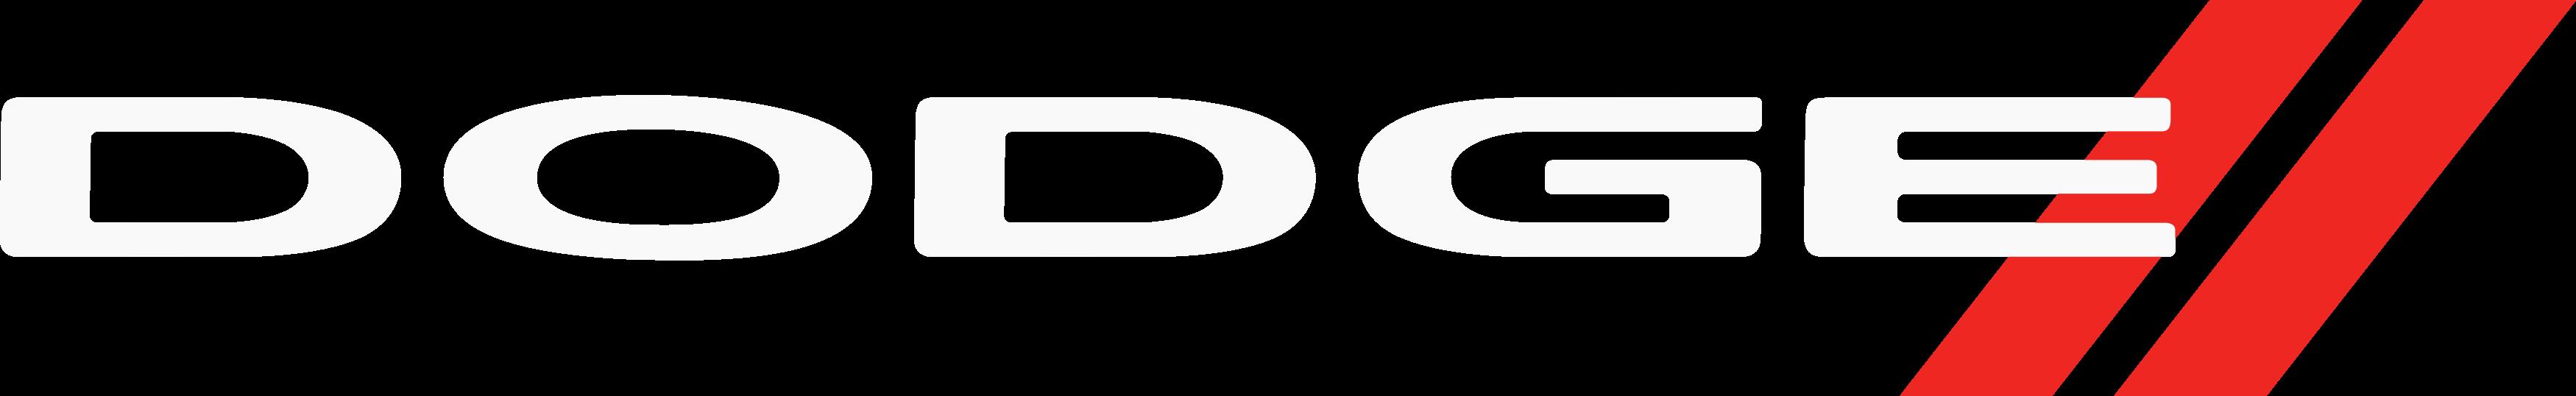 dodge logo 1 - Dodge Logo